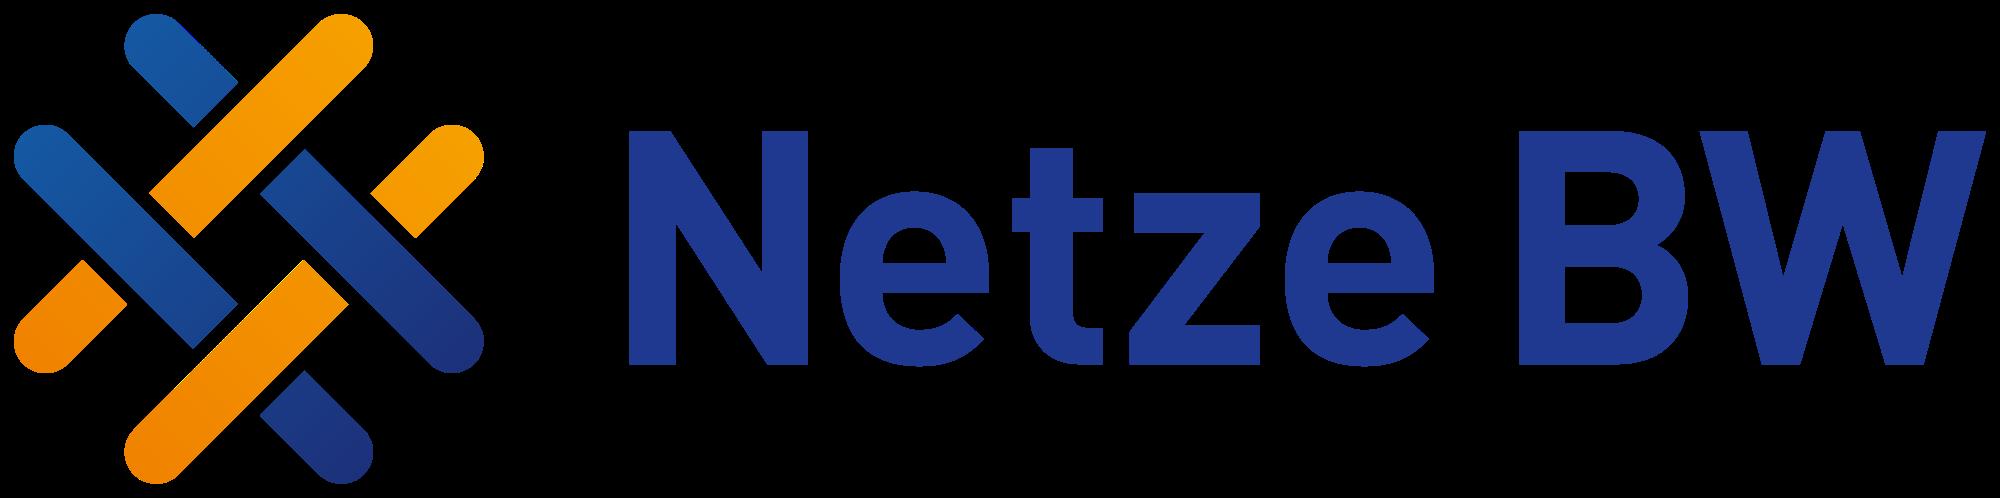 Berg-Macher-Netze_BW_logo